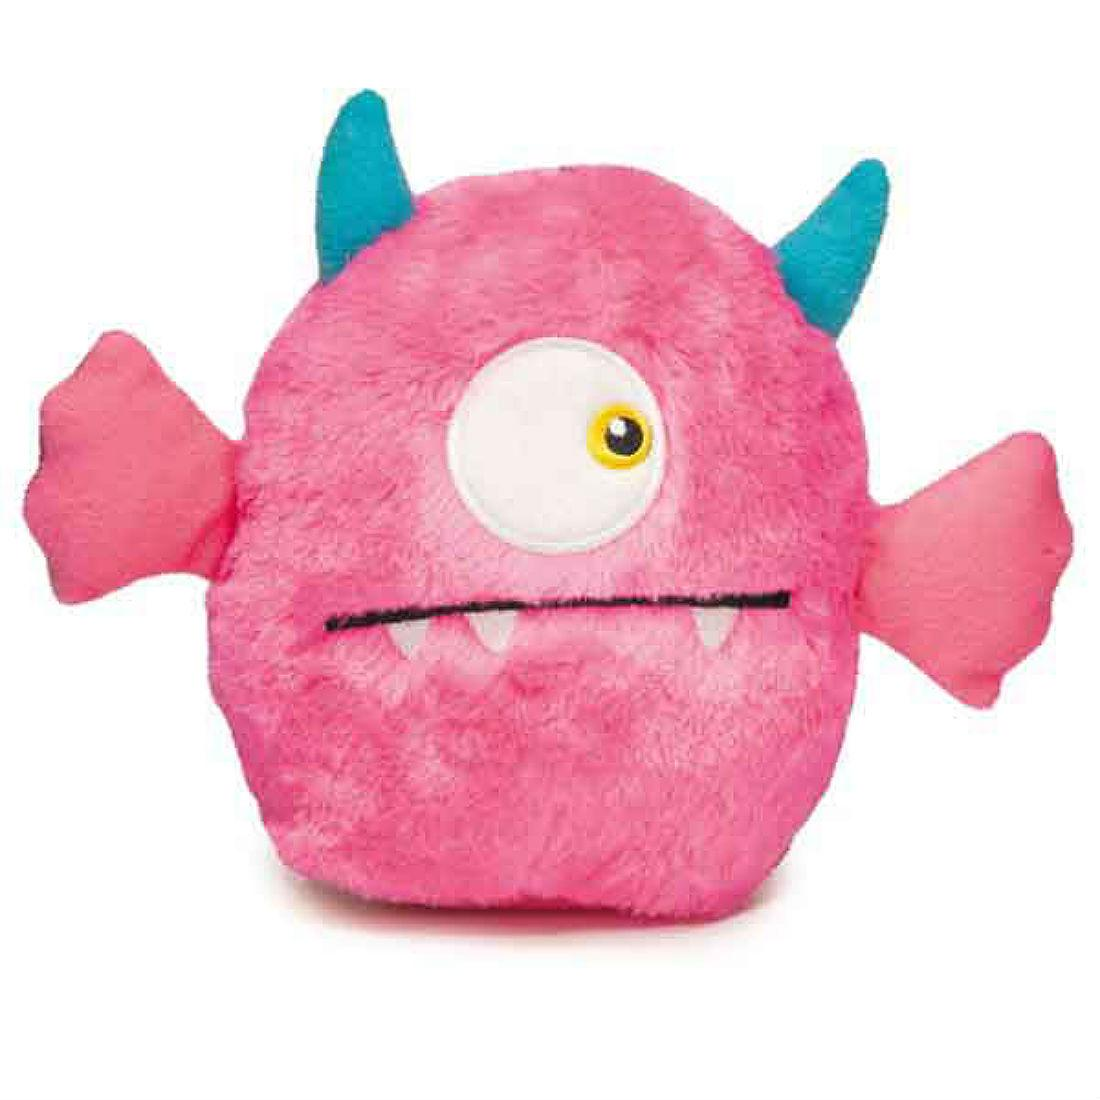 Zanies Rock Monster Plush Dog Toy - Pink